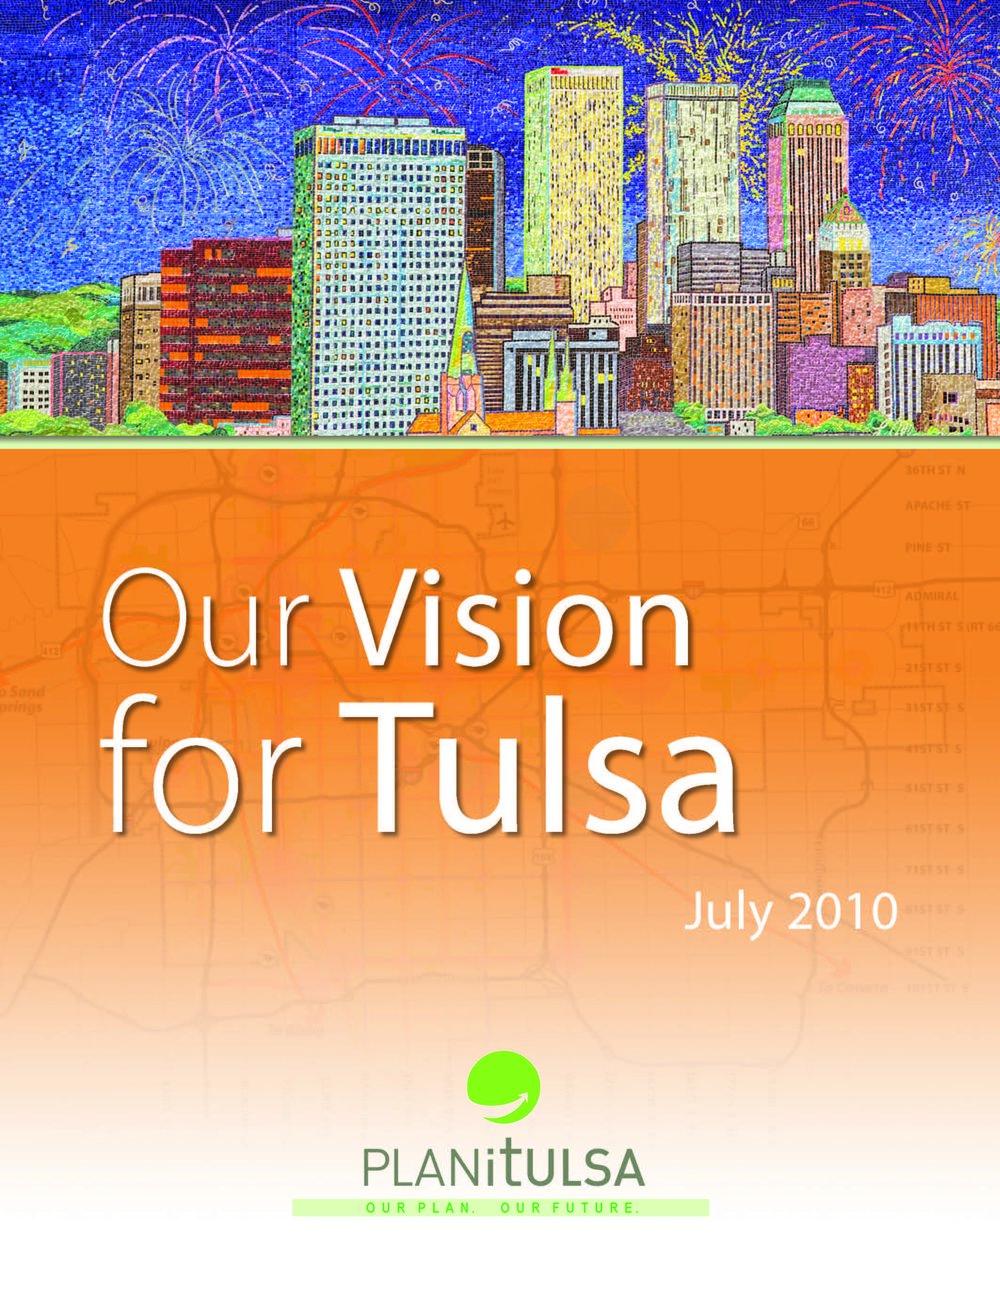 tulsa-vision-062910 1.jpg